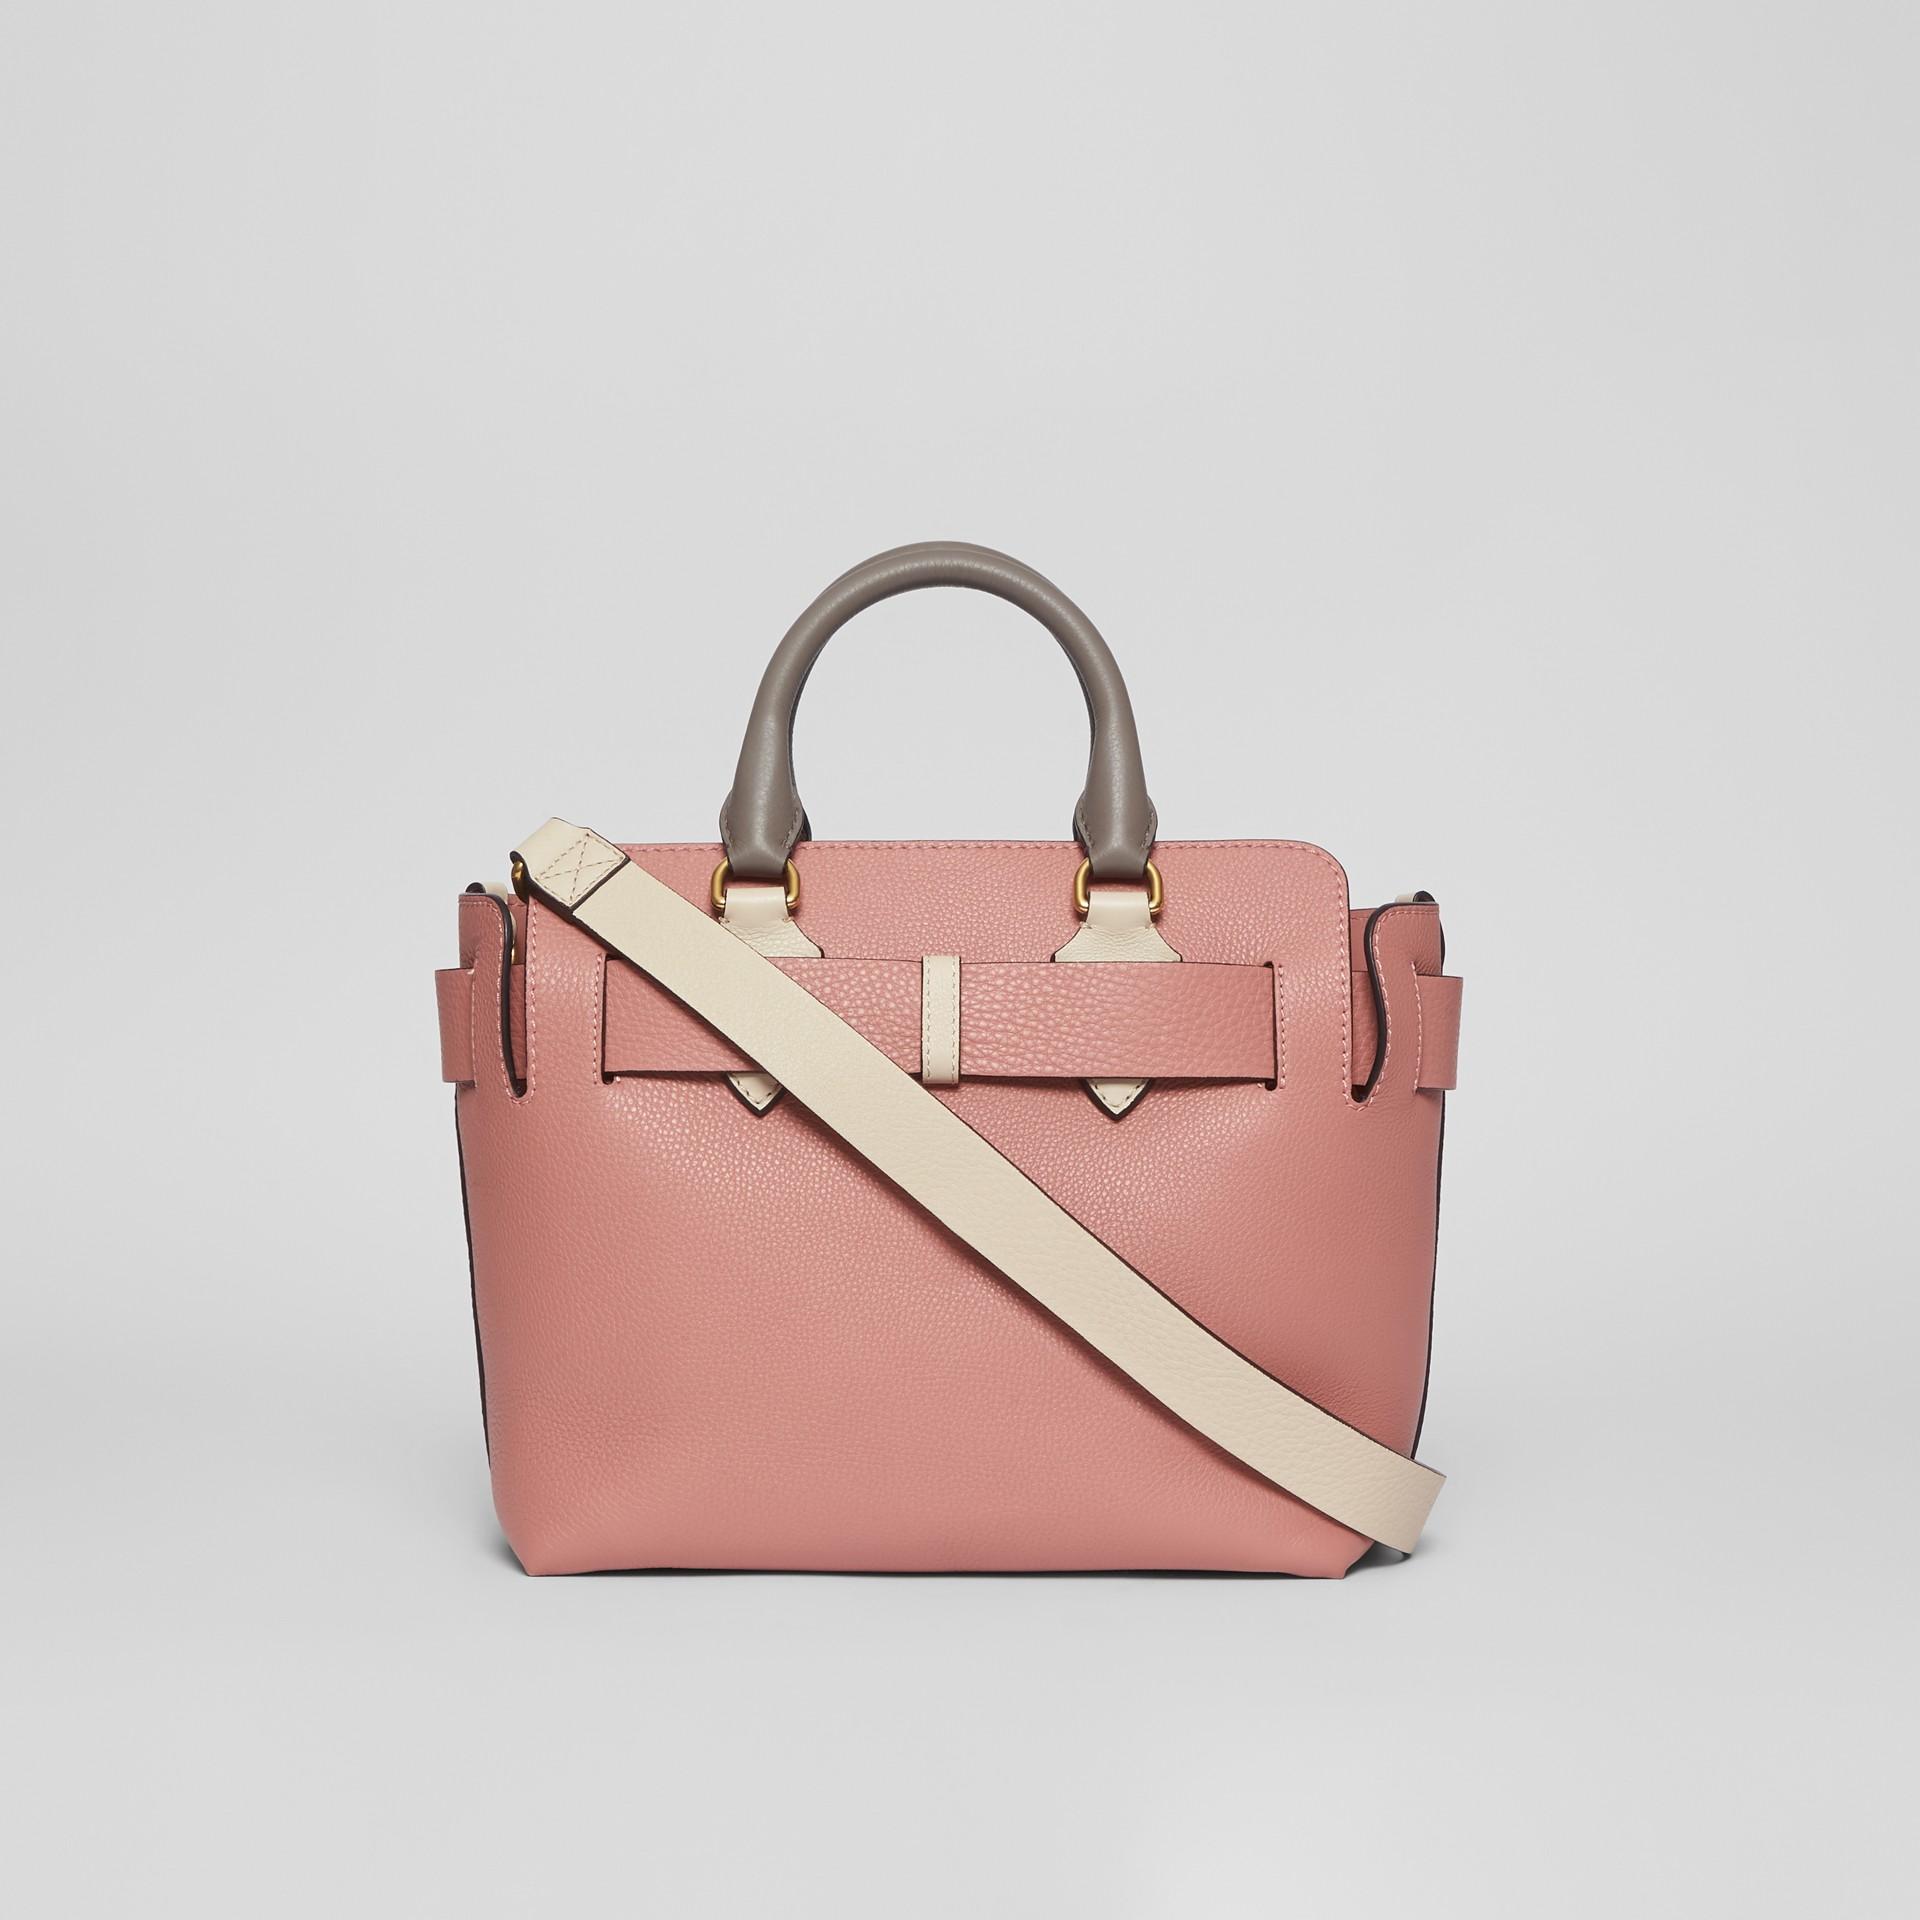 The Small Belt Bag aus Leder in Dreitonoptik (Kalksteinfarben/altrosenfarben) - Damen | Burberry - Galerie-Bild 7